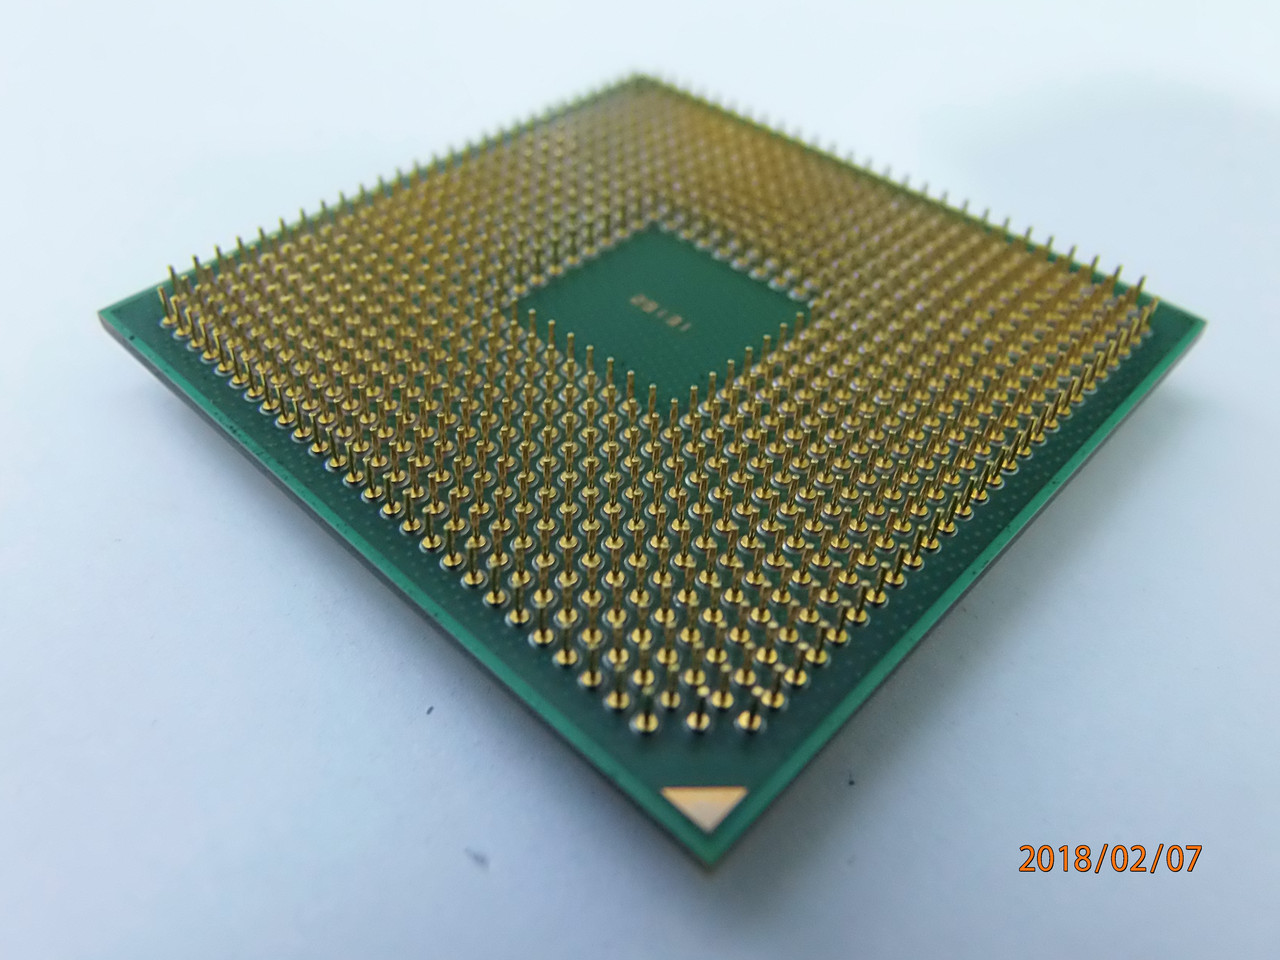 Процессор AMD Sempron 64 2600+ 1.6 Ghz